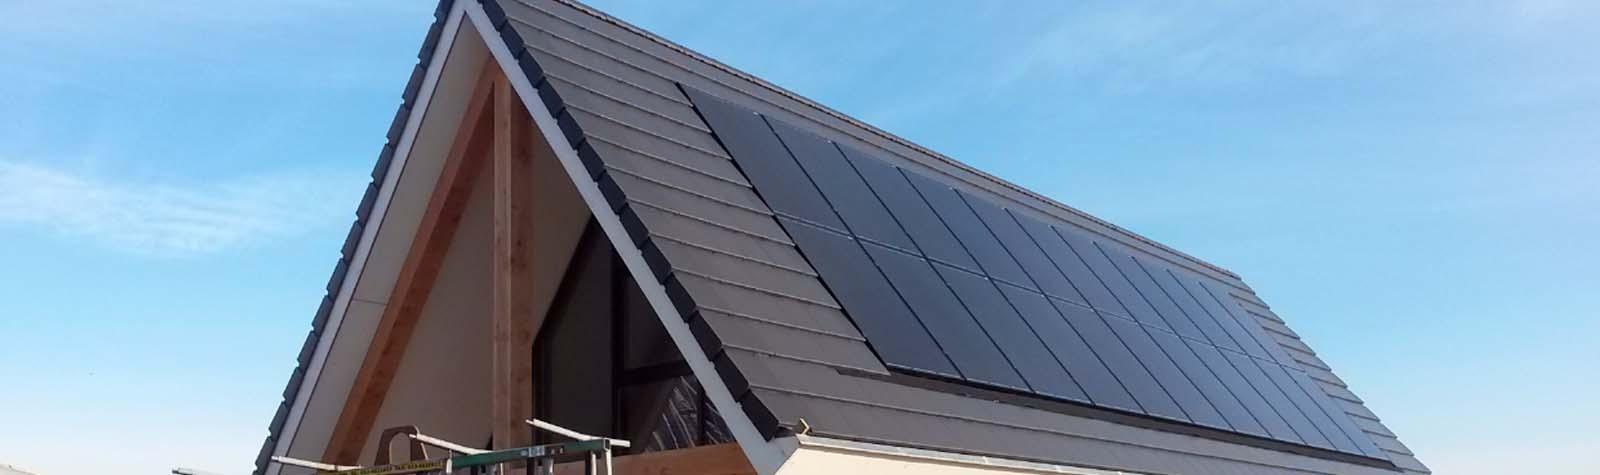 zonne-energie-duurzaam-bouwen